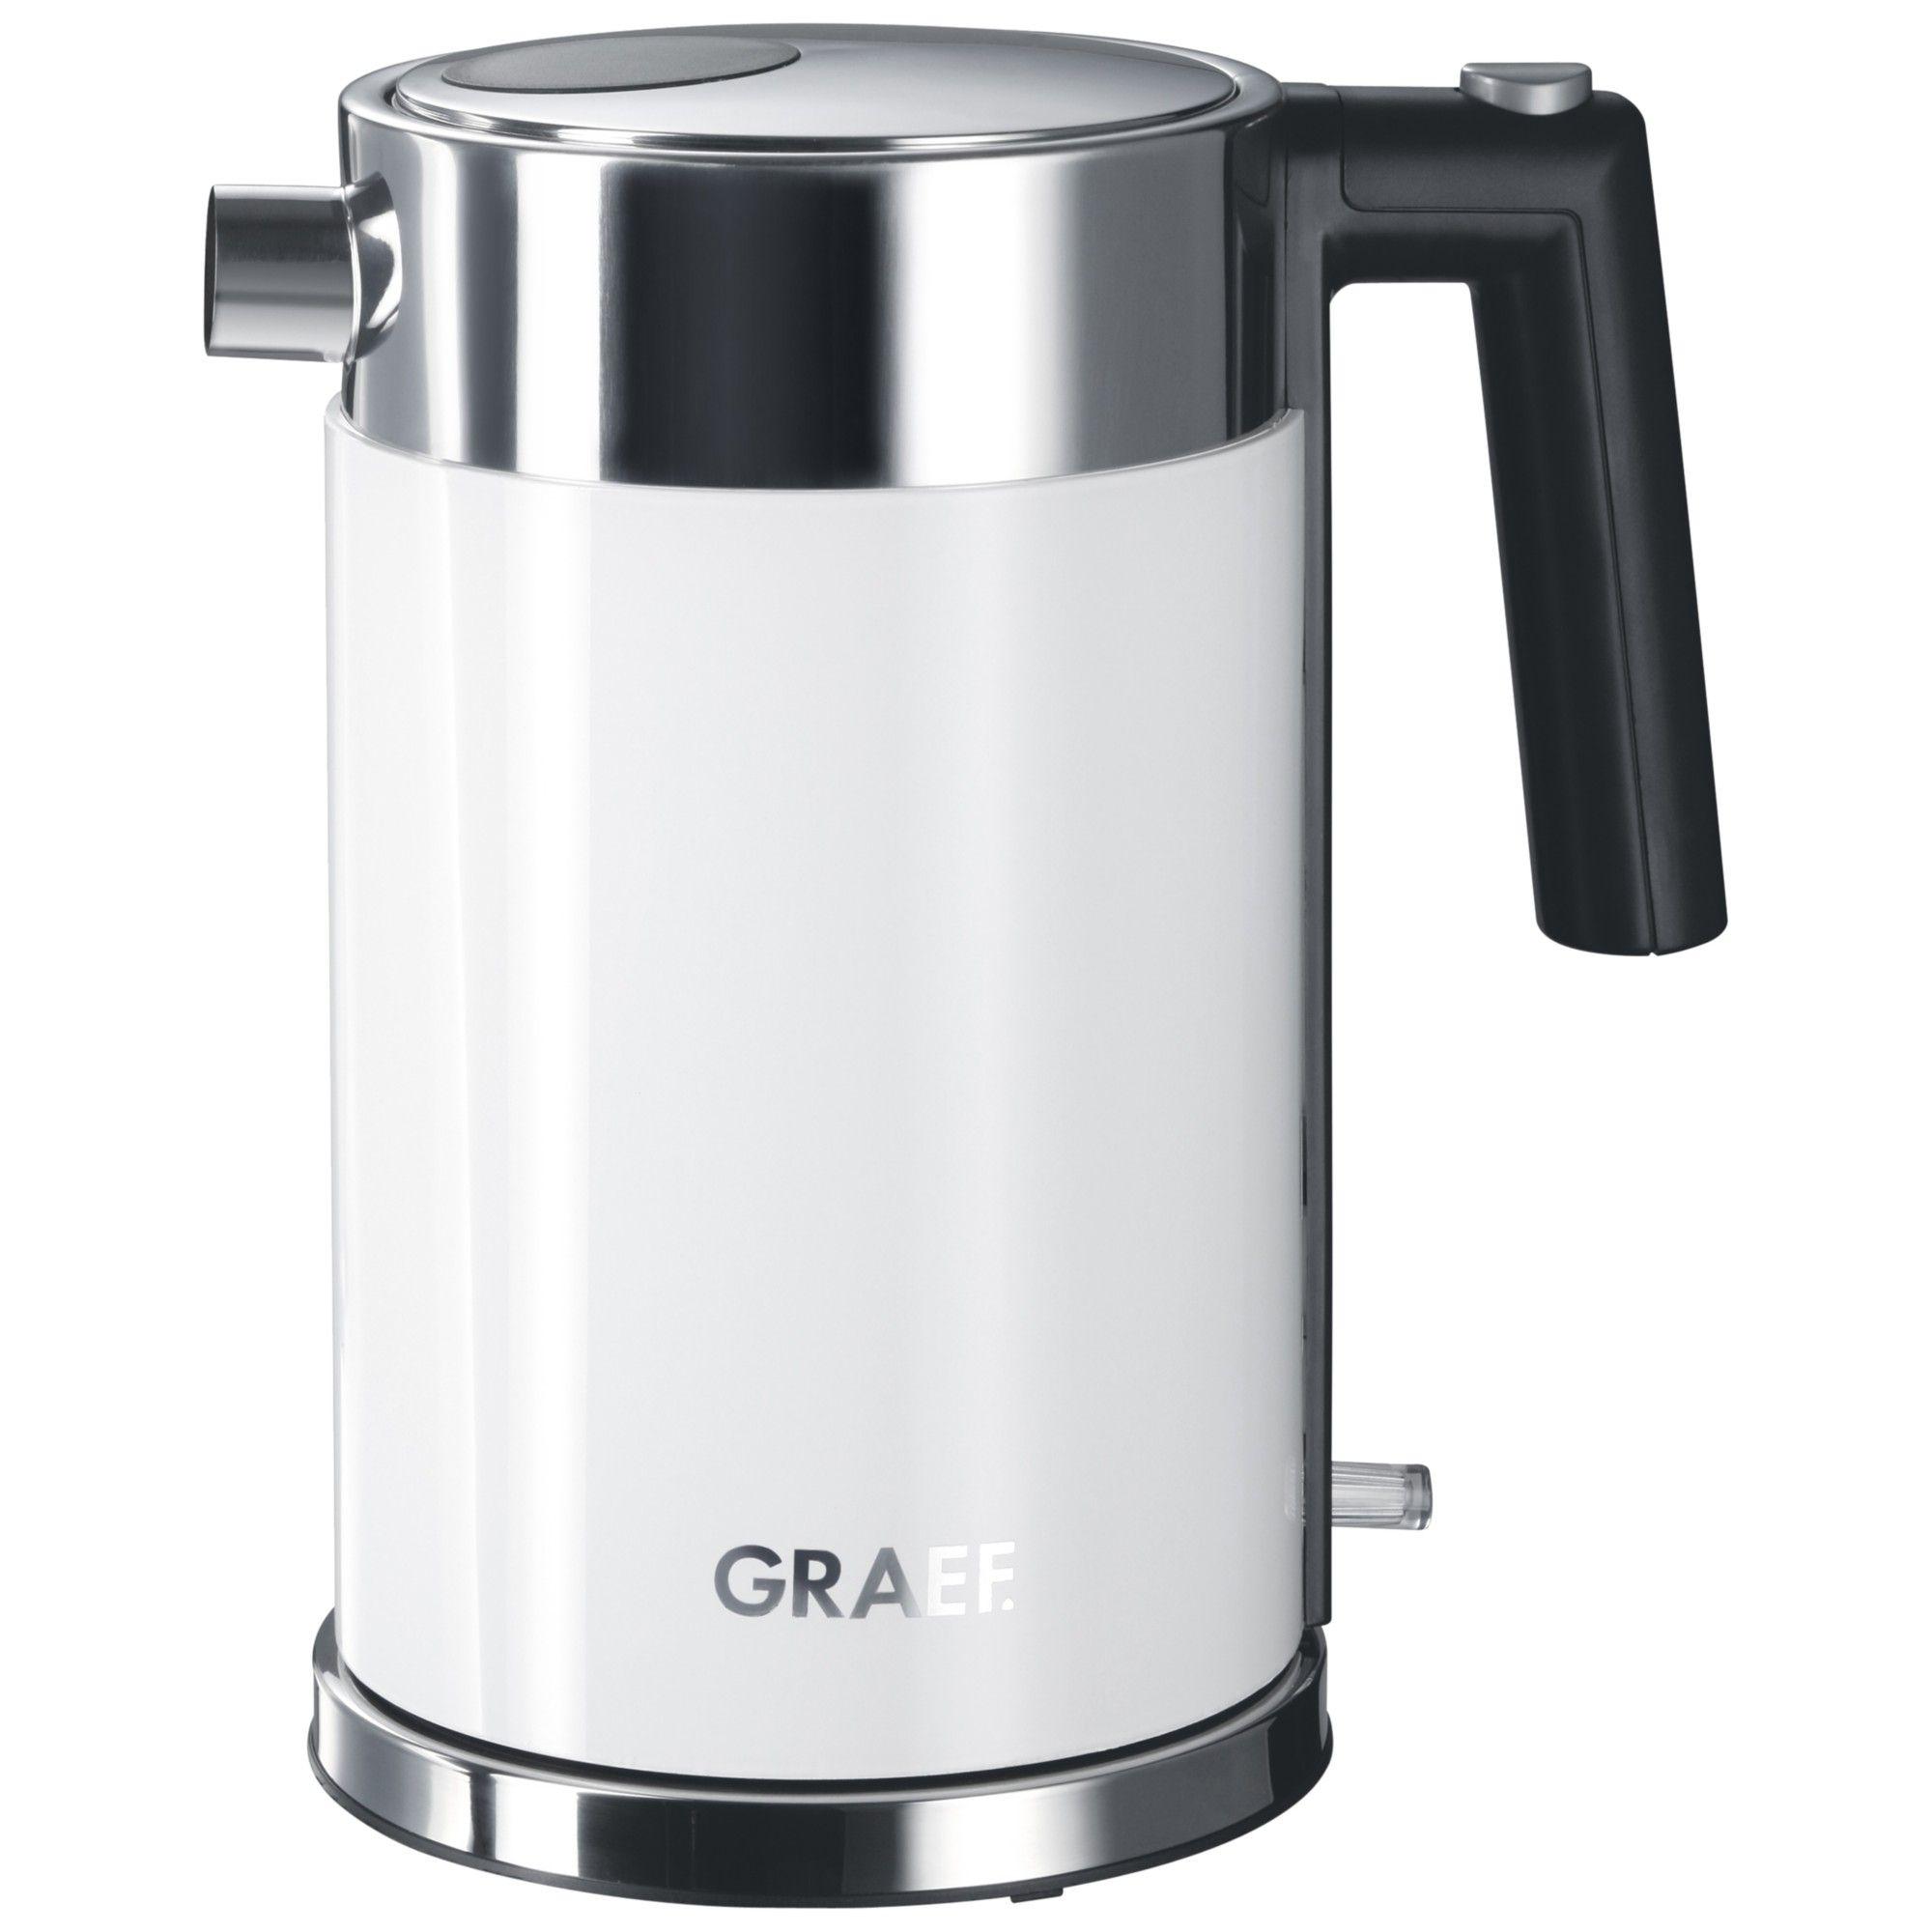 Graef long slot 2slice toaster brushed silver electric